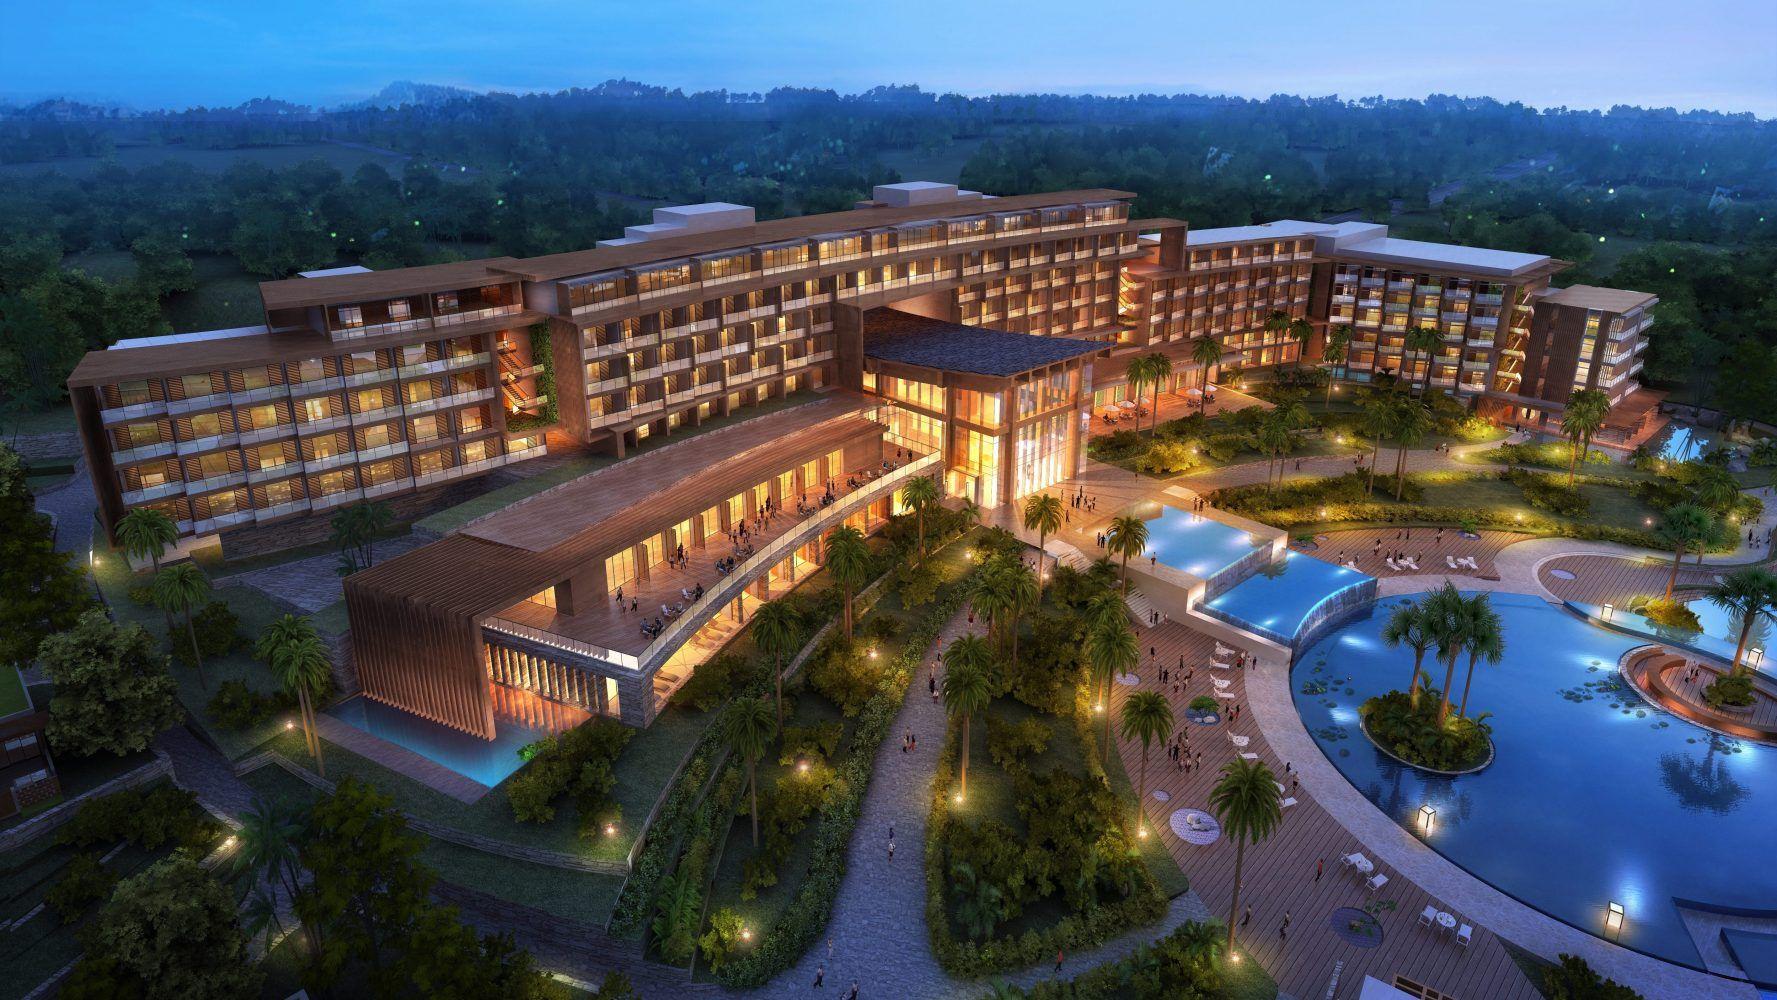 Xiamen Yuehwa Resort Hotel Resort Villa Hotel Project Architecture Hotels And Resorts